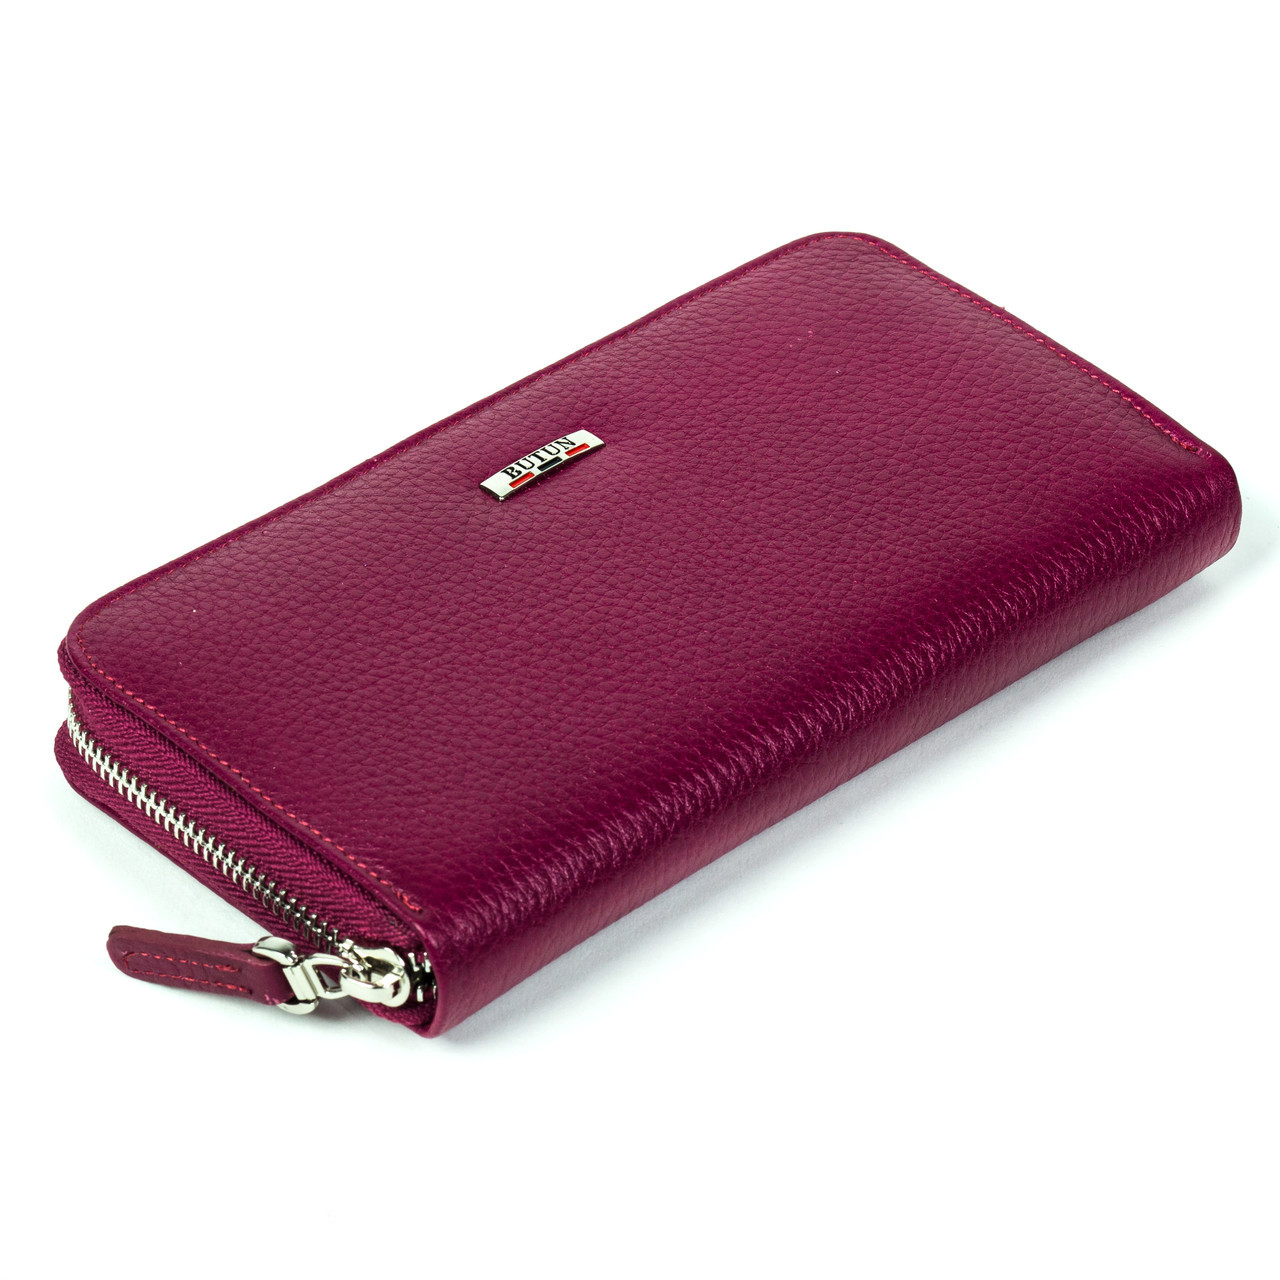 Женский кошелек Butun 639-004-005 кожаный марсала